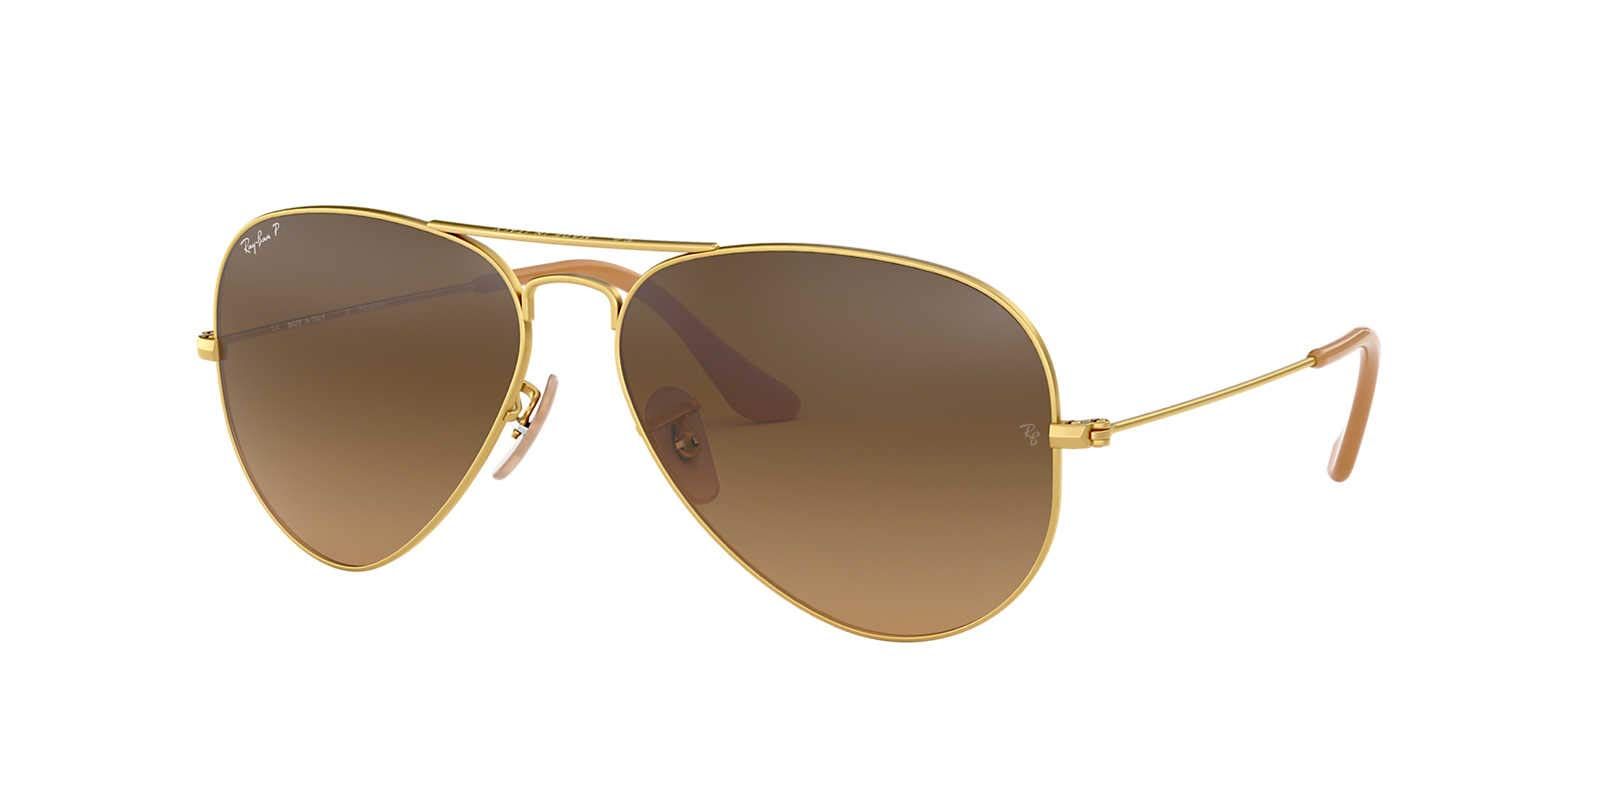 Ray-Ban Original Aviator Sunglasses (RB3025) Gold Matte/Brown Metal - Polarized - 58mm